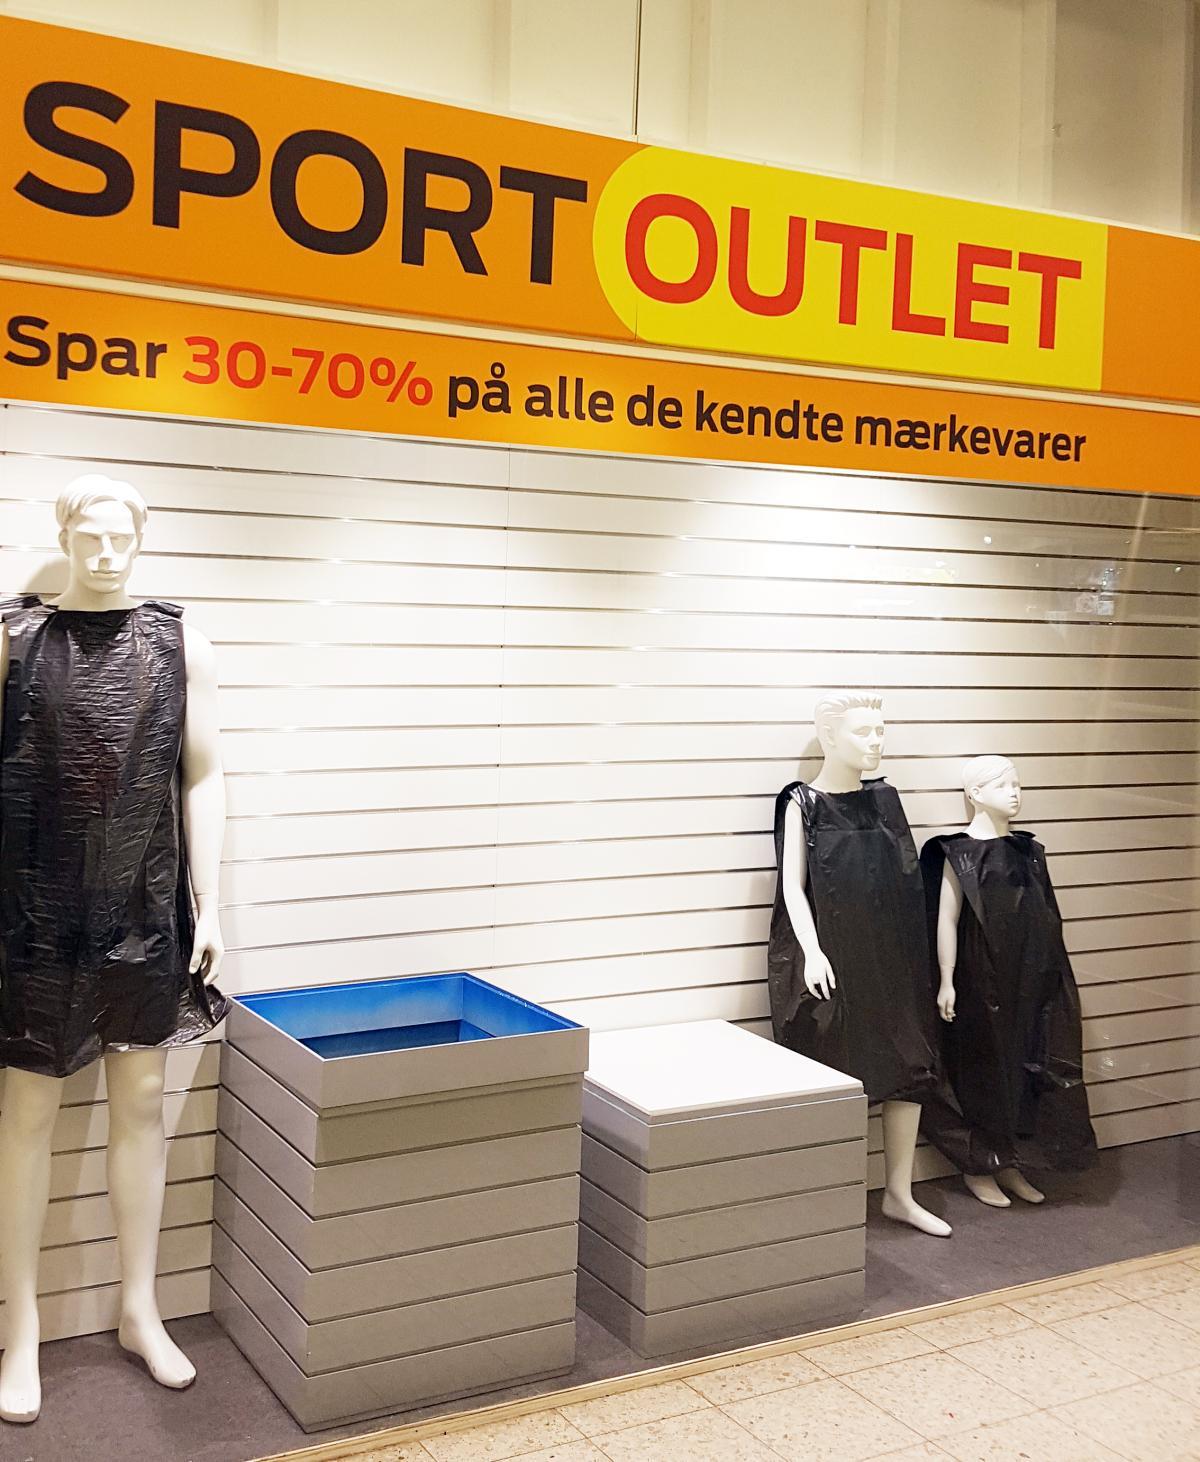 8750798925 Ny sportsbutik åbnet i Søndercentret | Skive Folkeblad